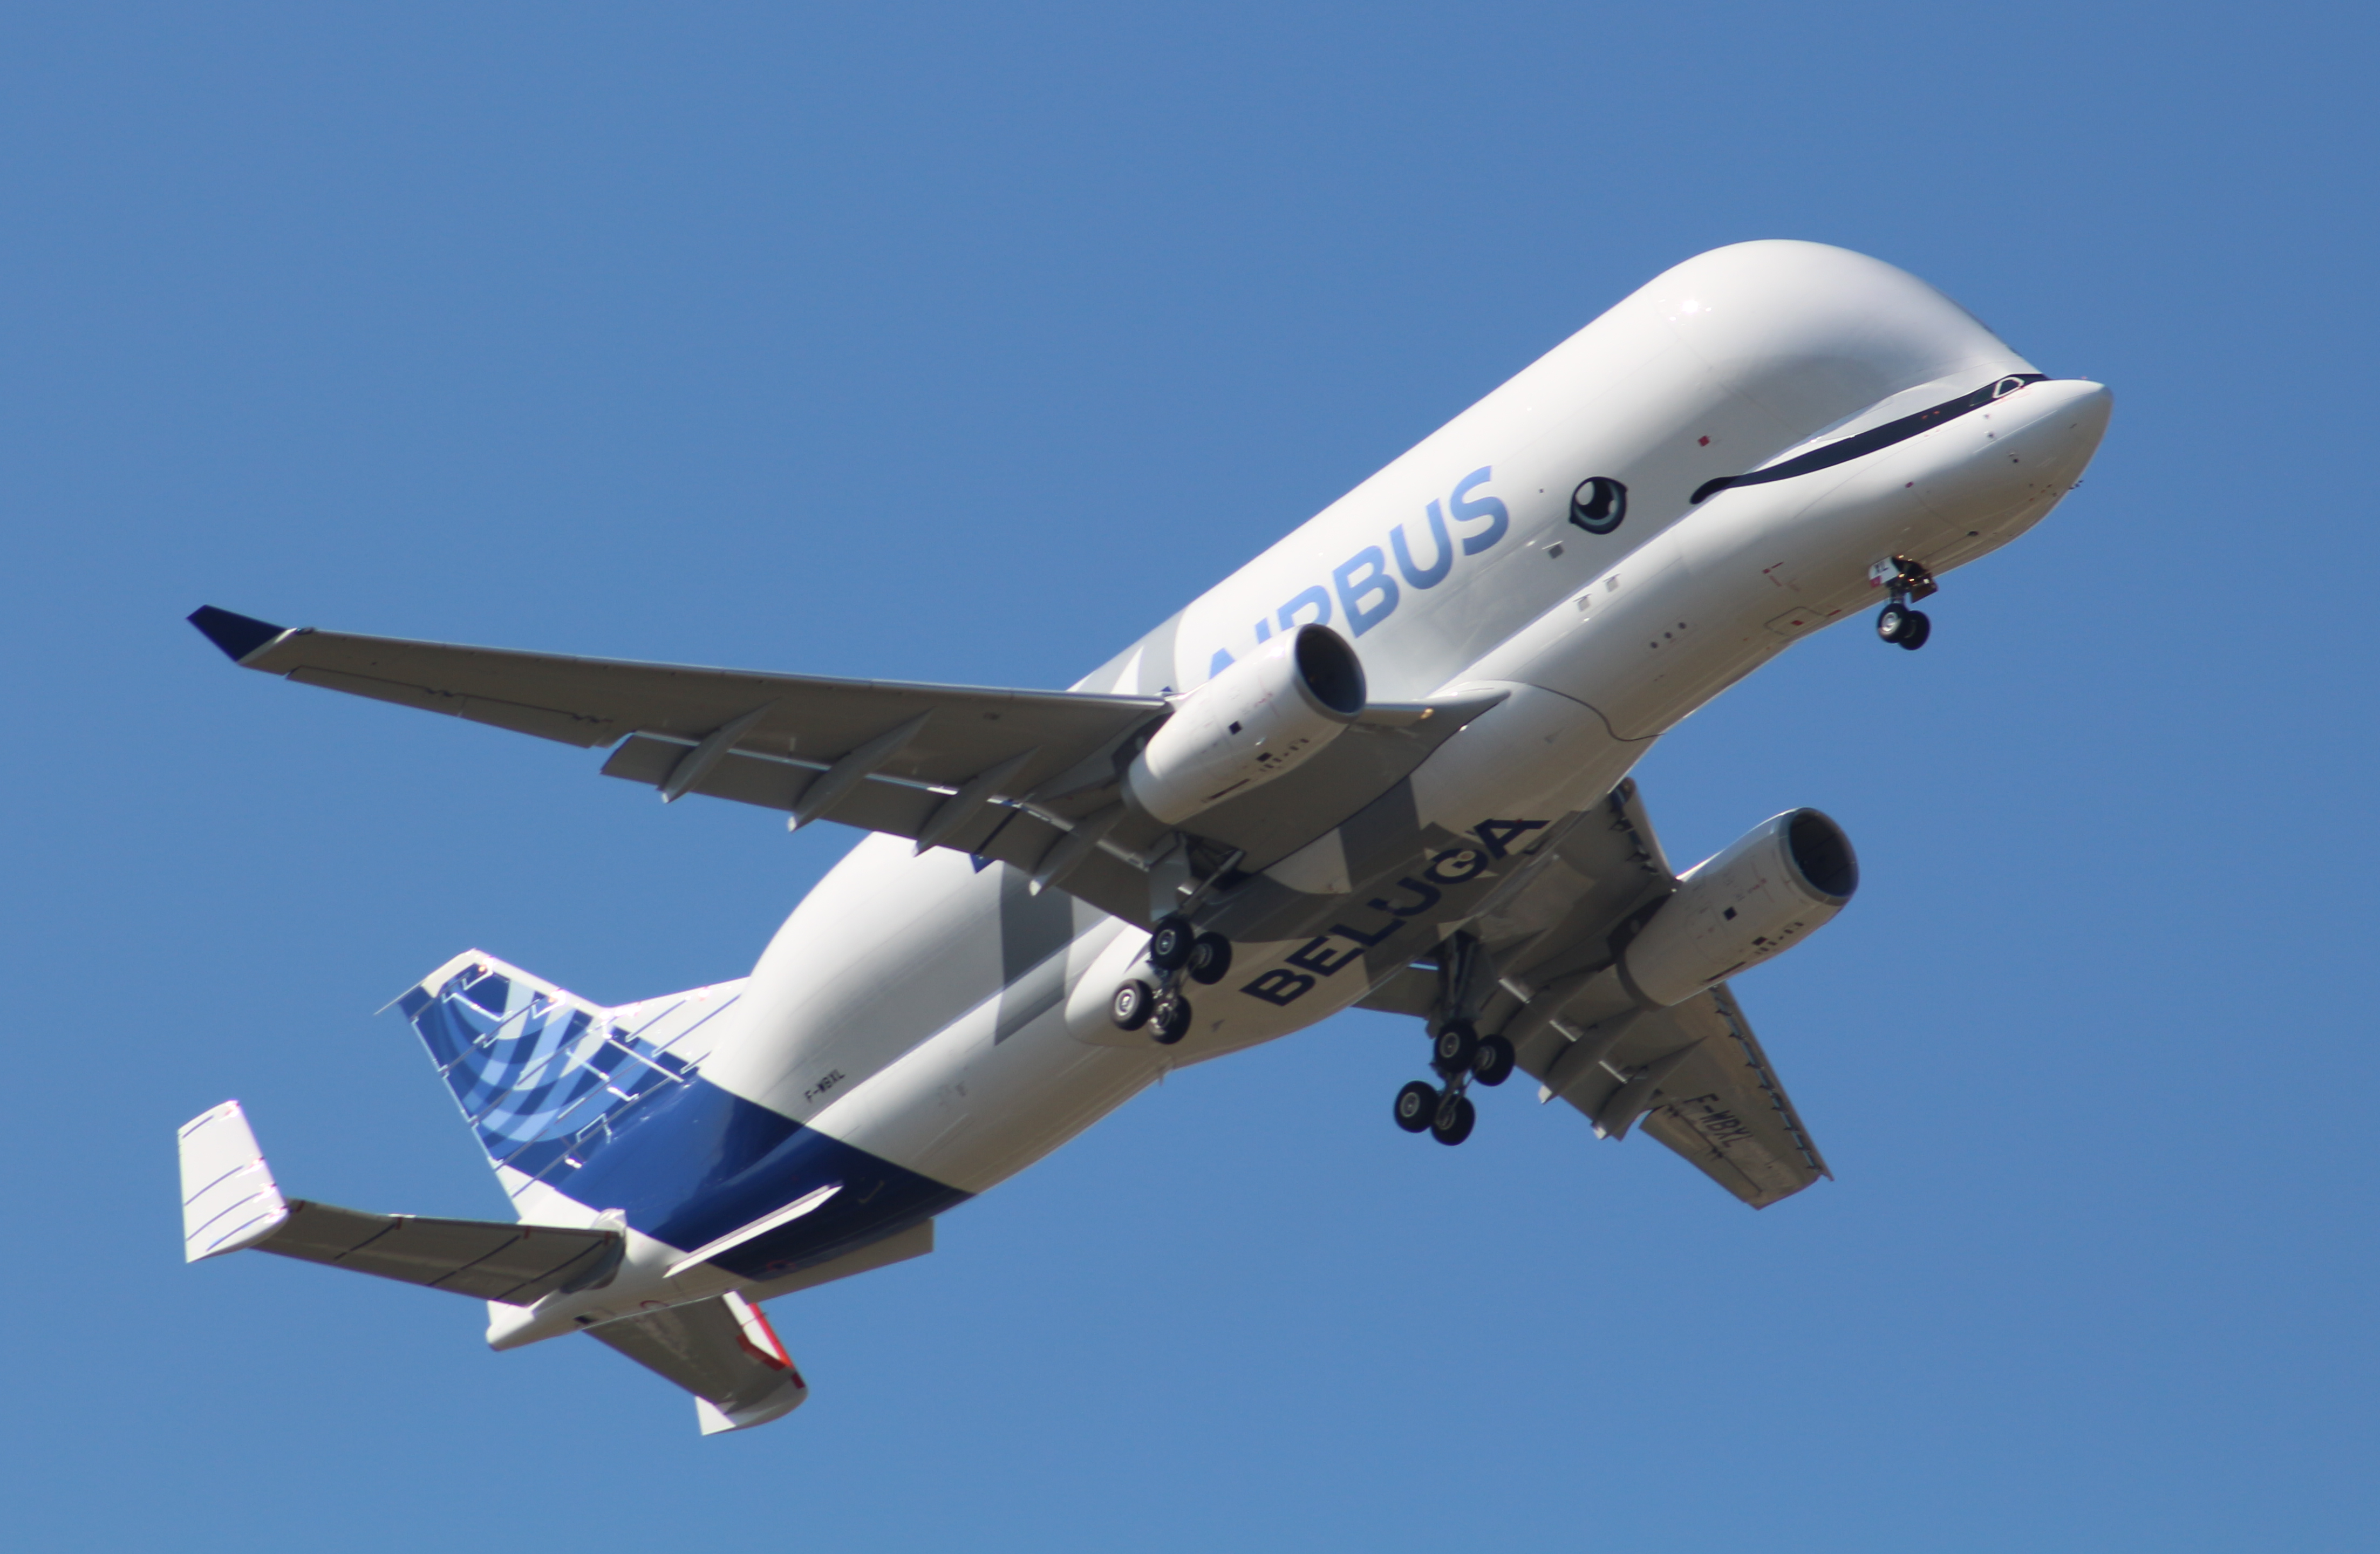 Airbus Beluga XL - Wikipedia